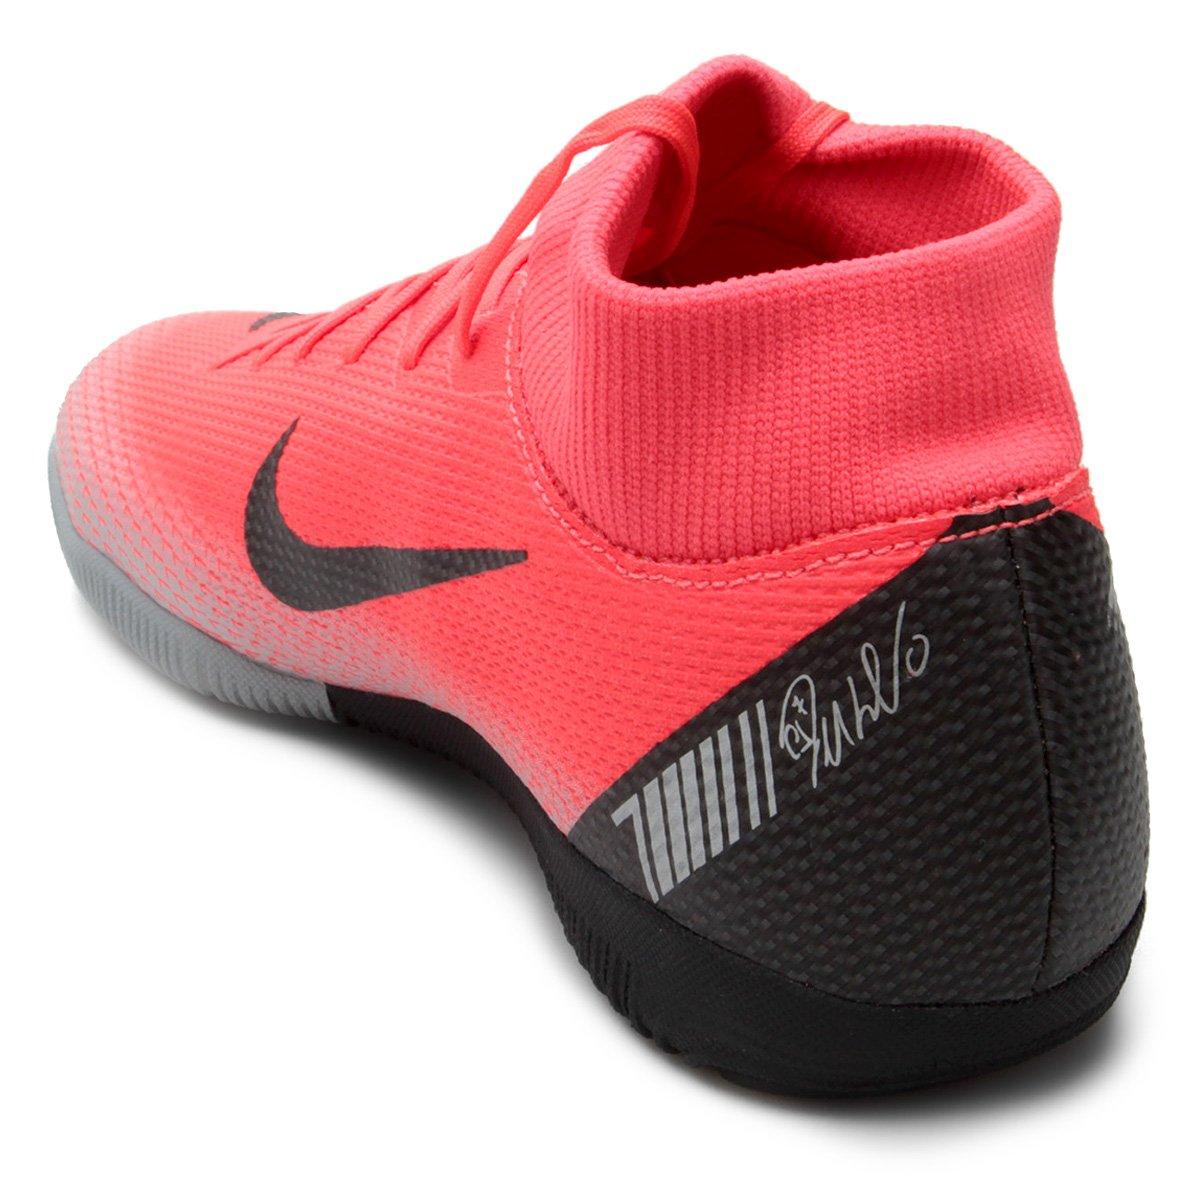 aab7018ca8 Chuteira Futsal Nike Mercurial Superfly 6 Academy CR7 IC - Tam  44 ...